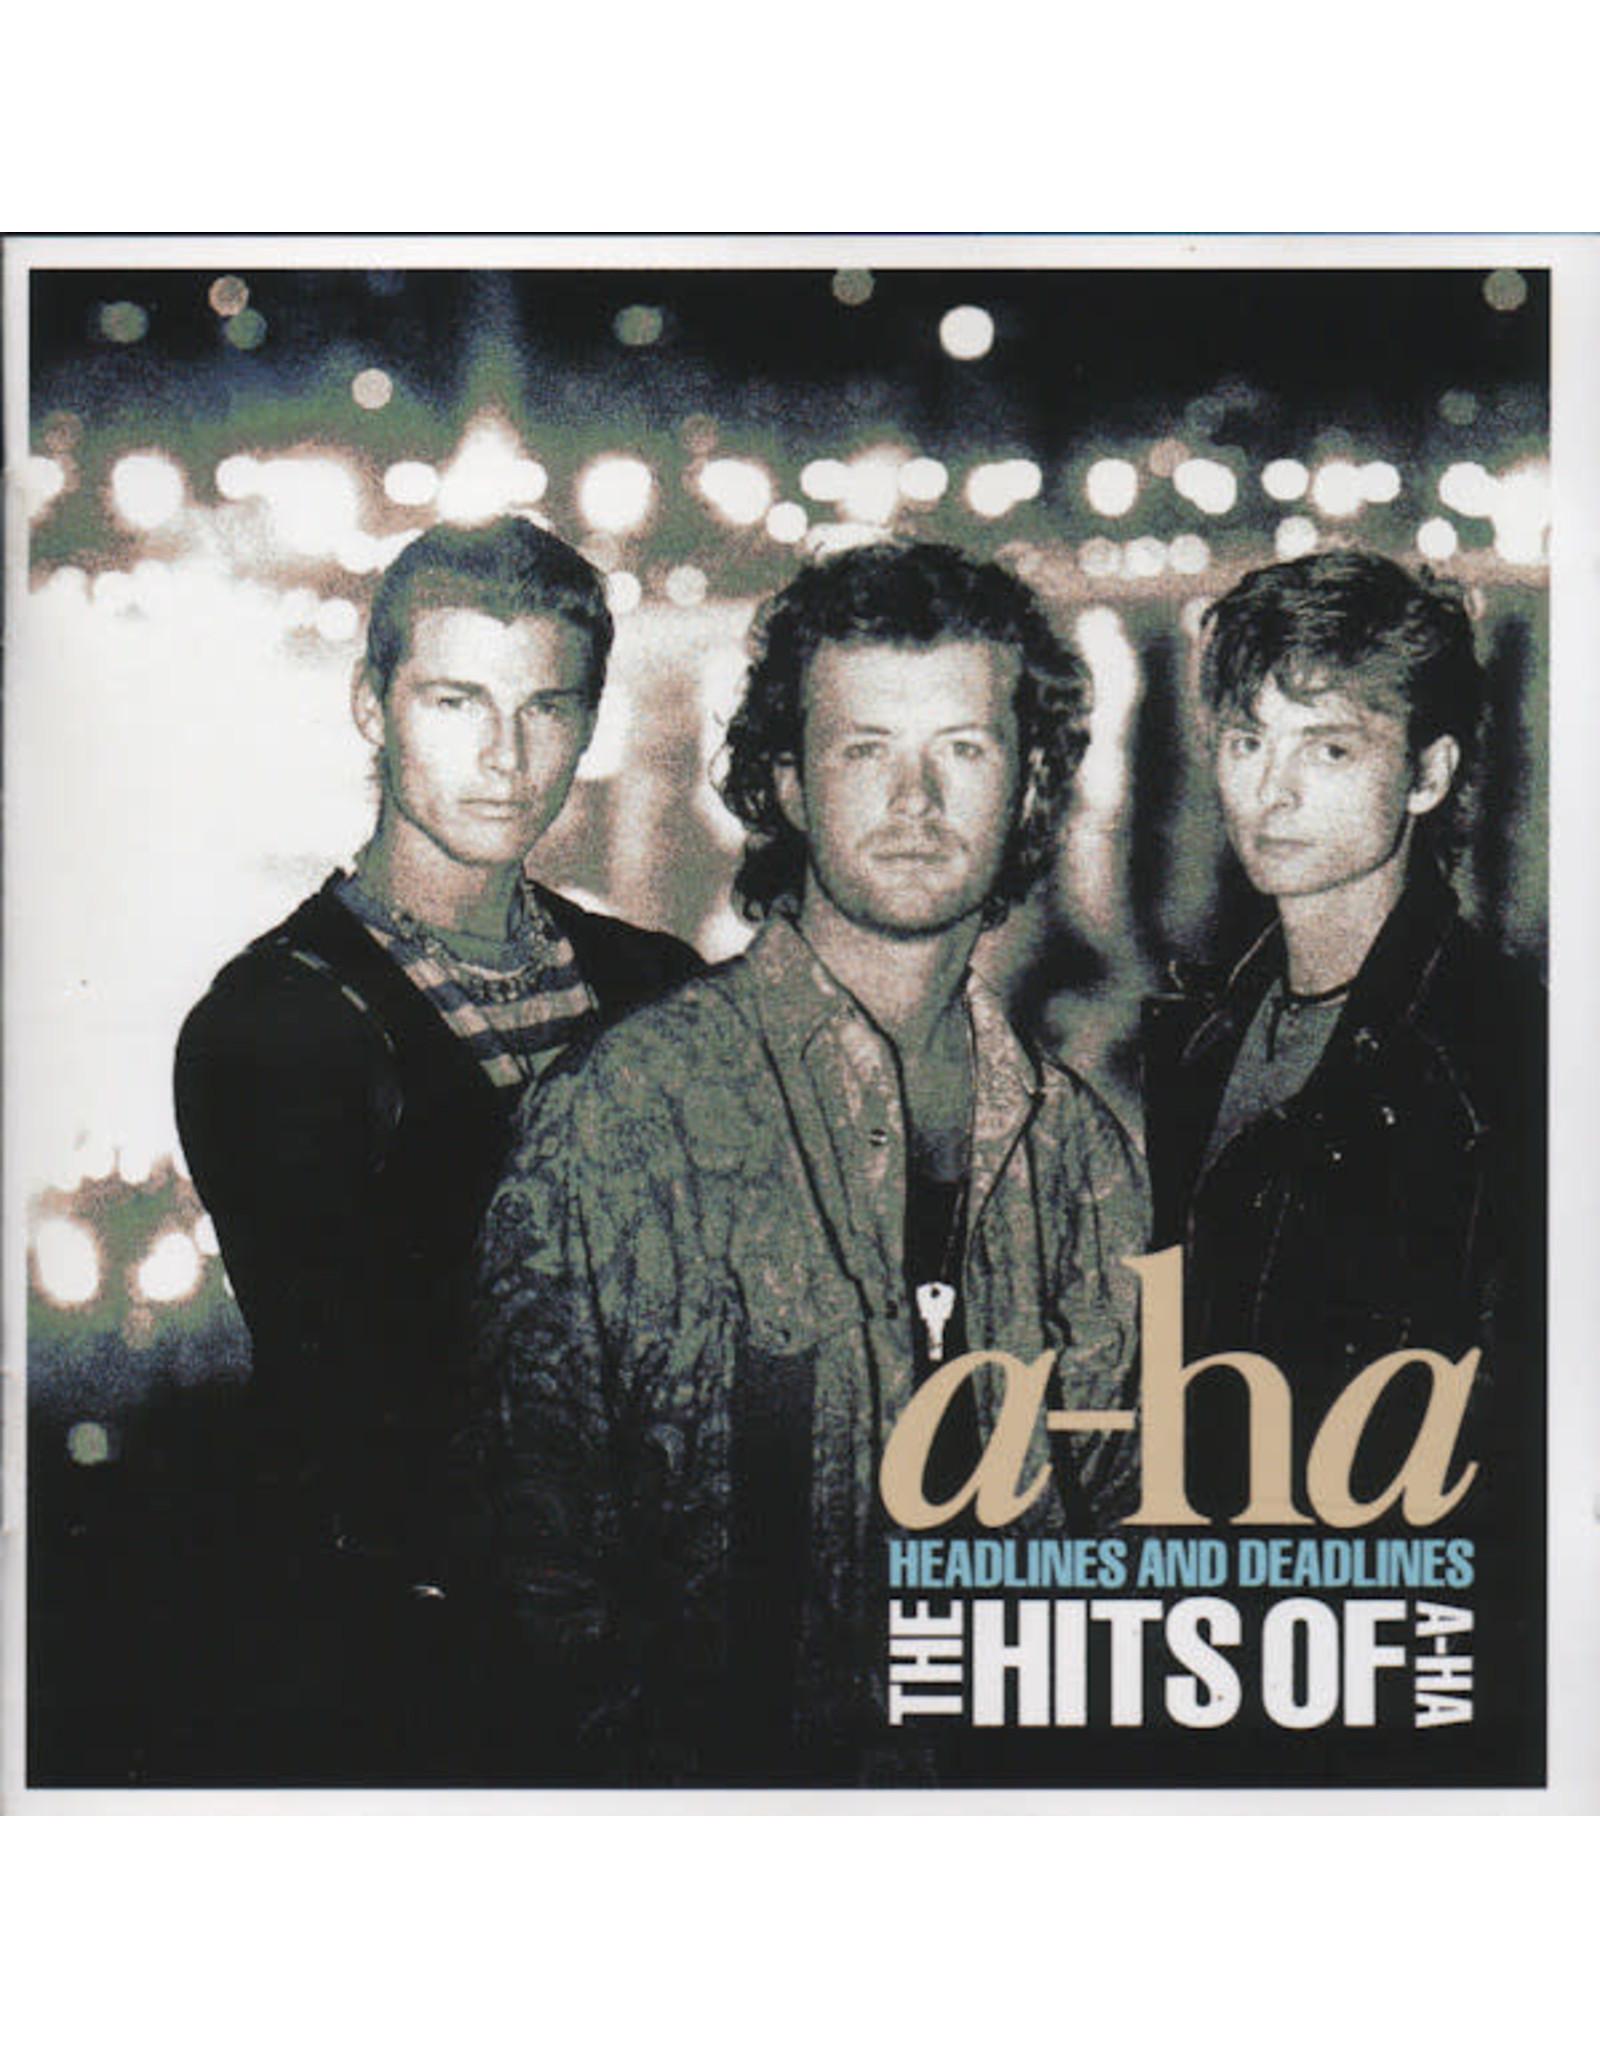 a-ha - Headlines & Deadlines (Greatest Hits)